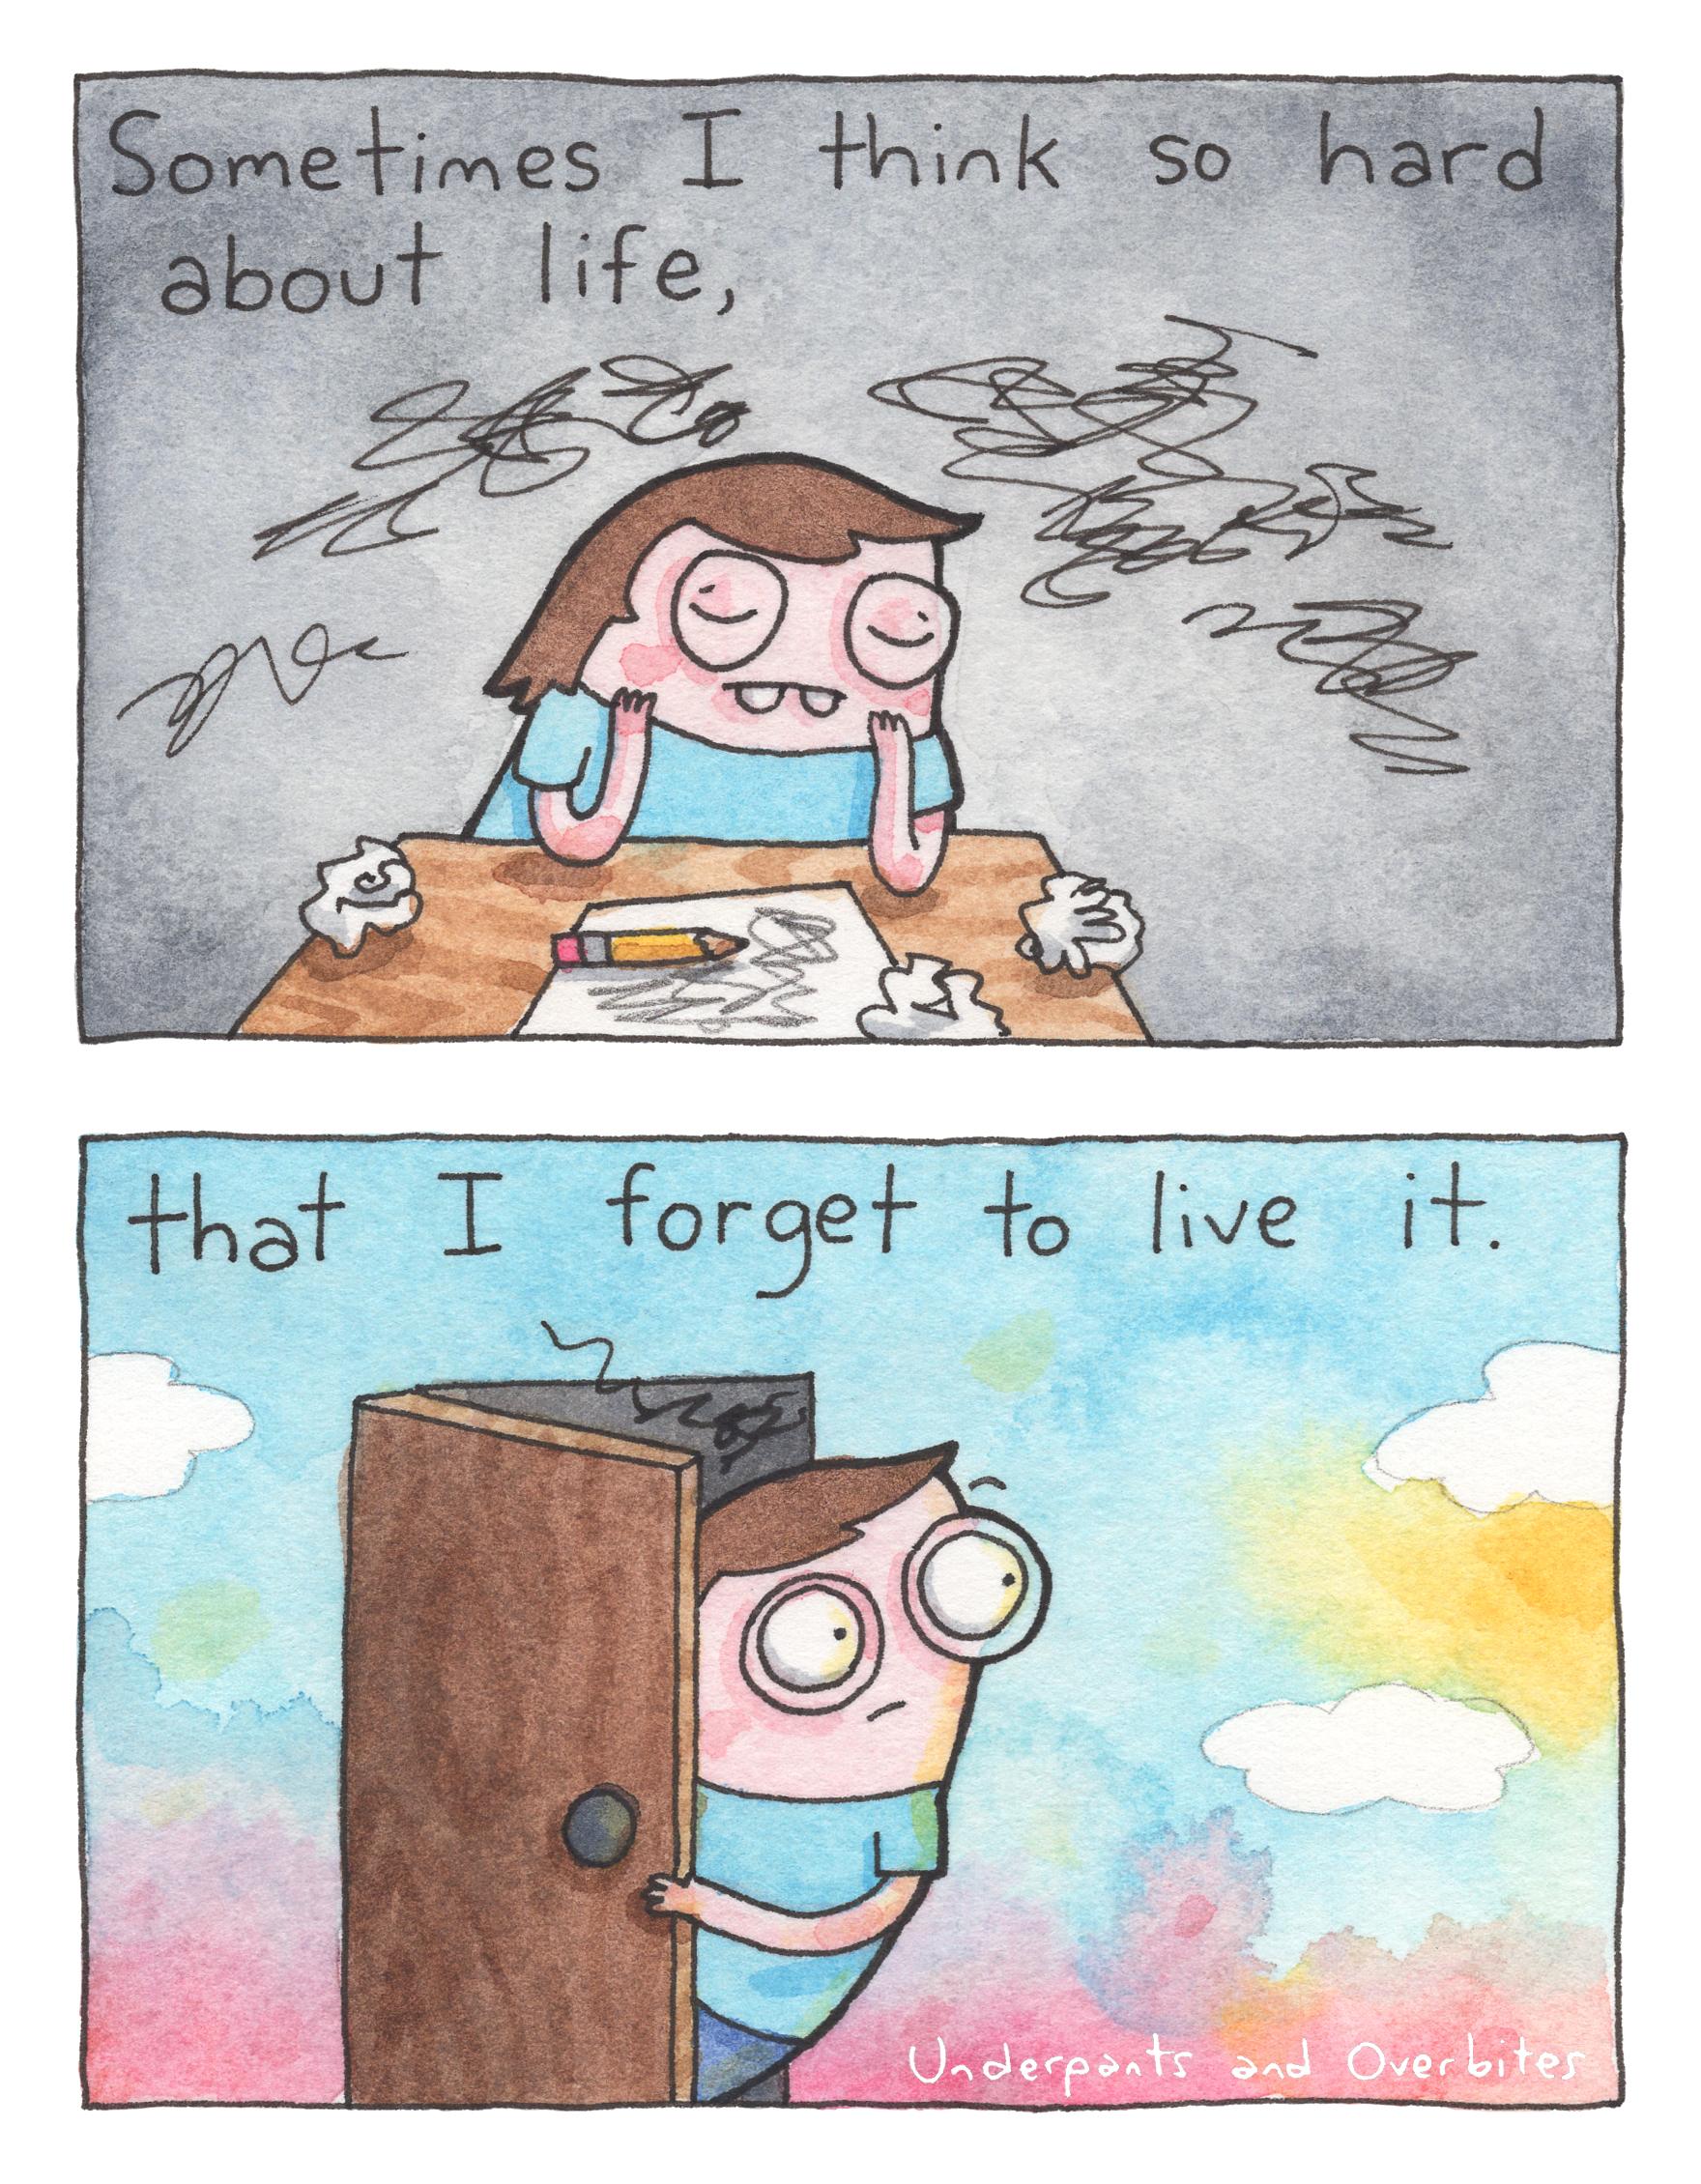 12-31 Life.jpg